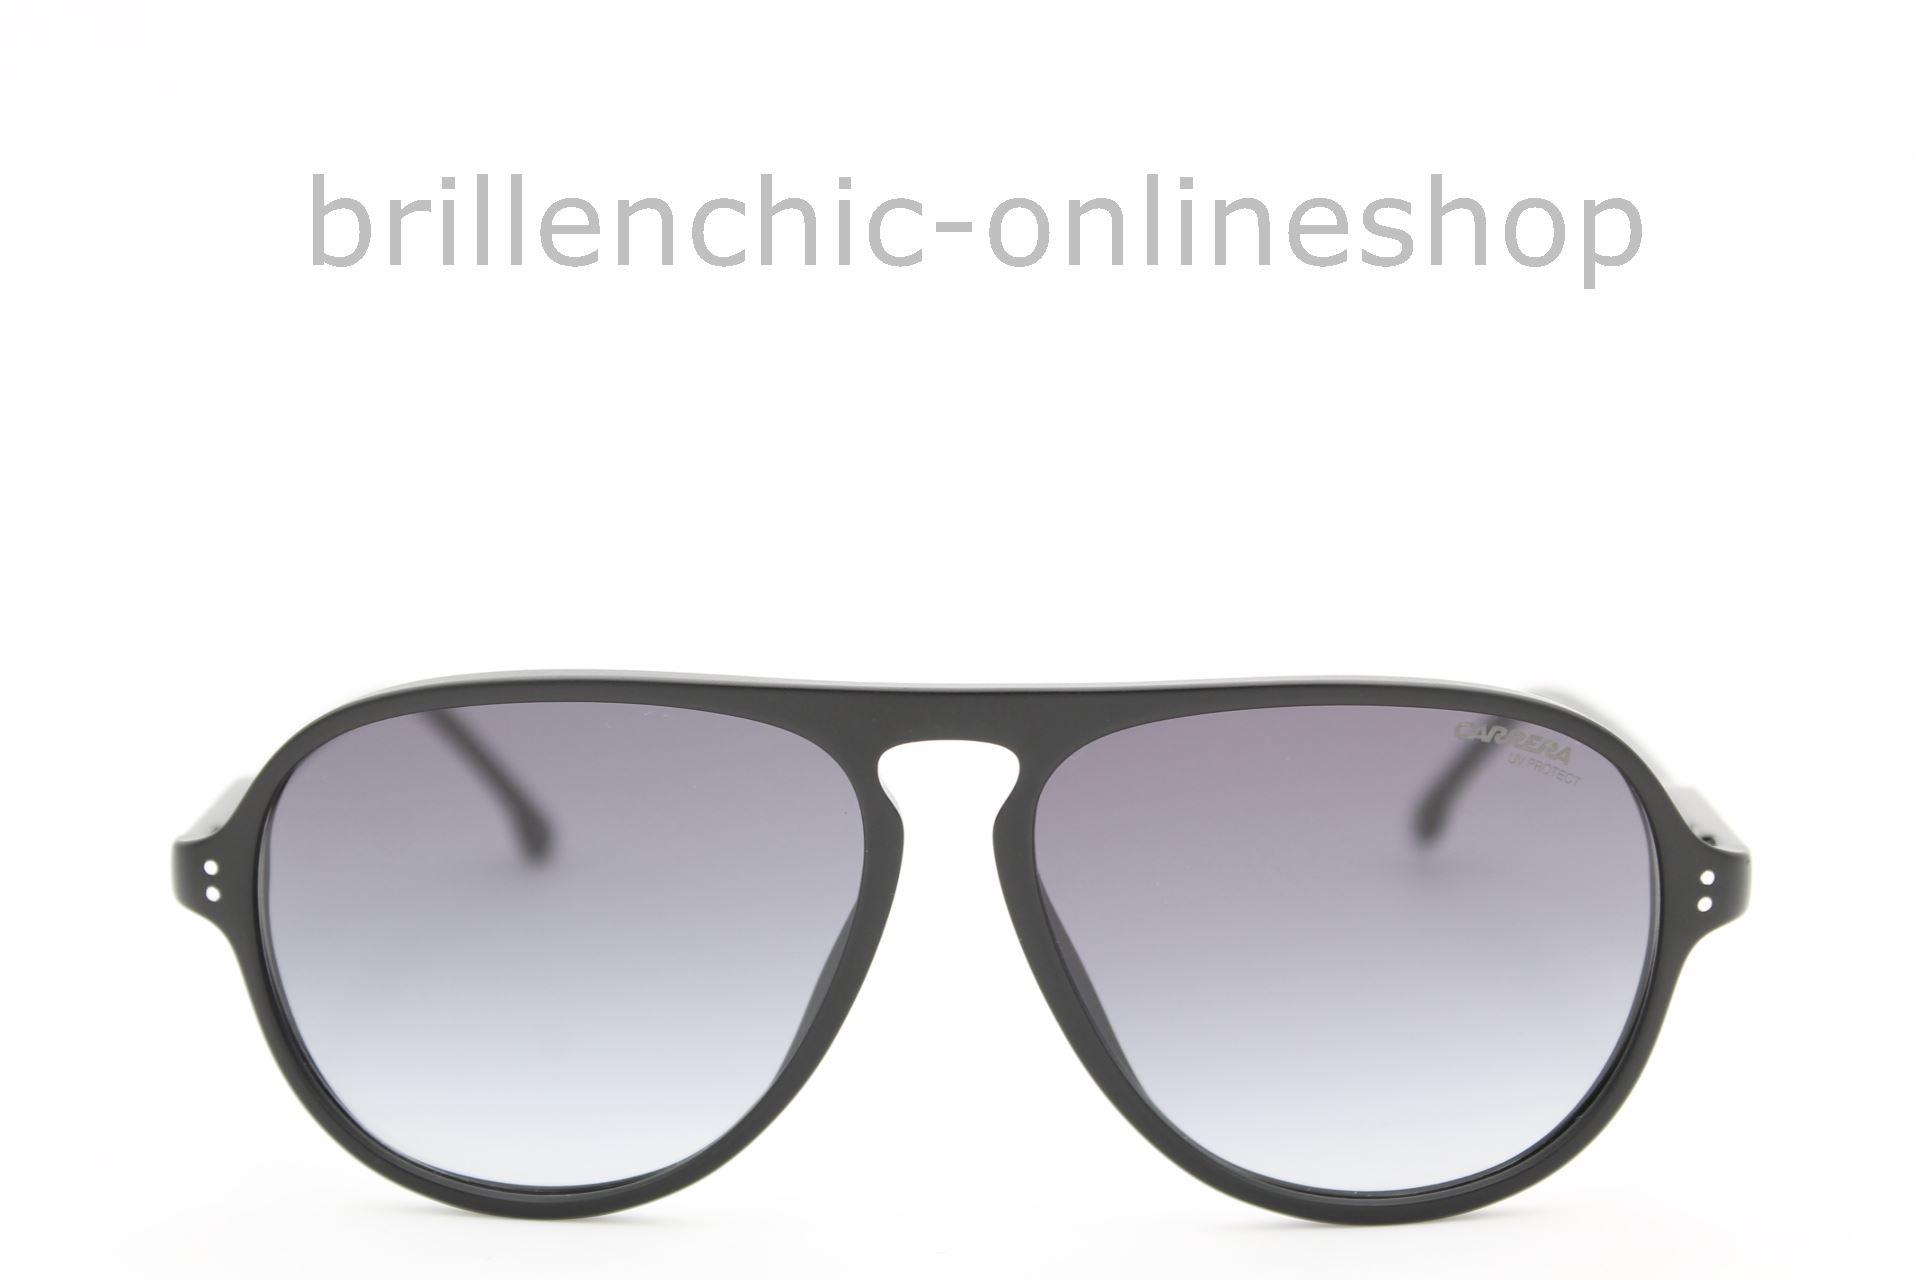 700eaf1344a9 Brillenchic-onlineshop in Berlin - CARRERA 198S 198 003 9O